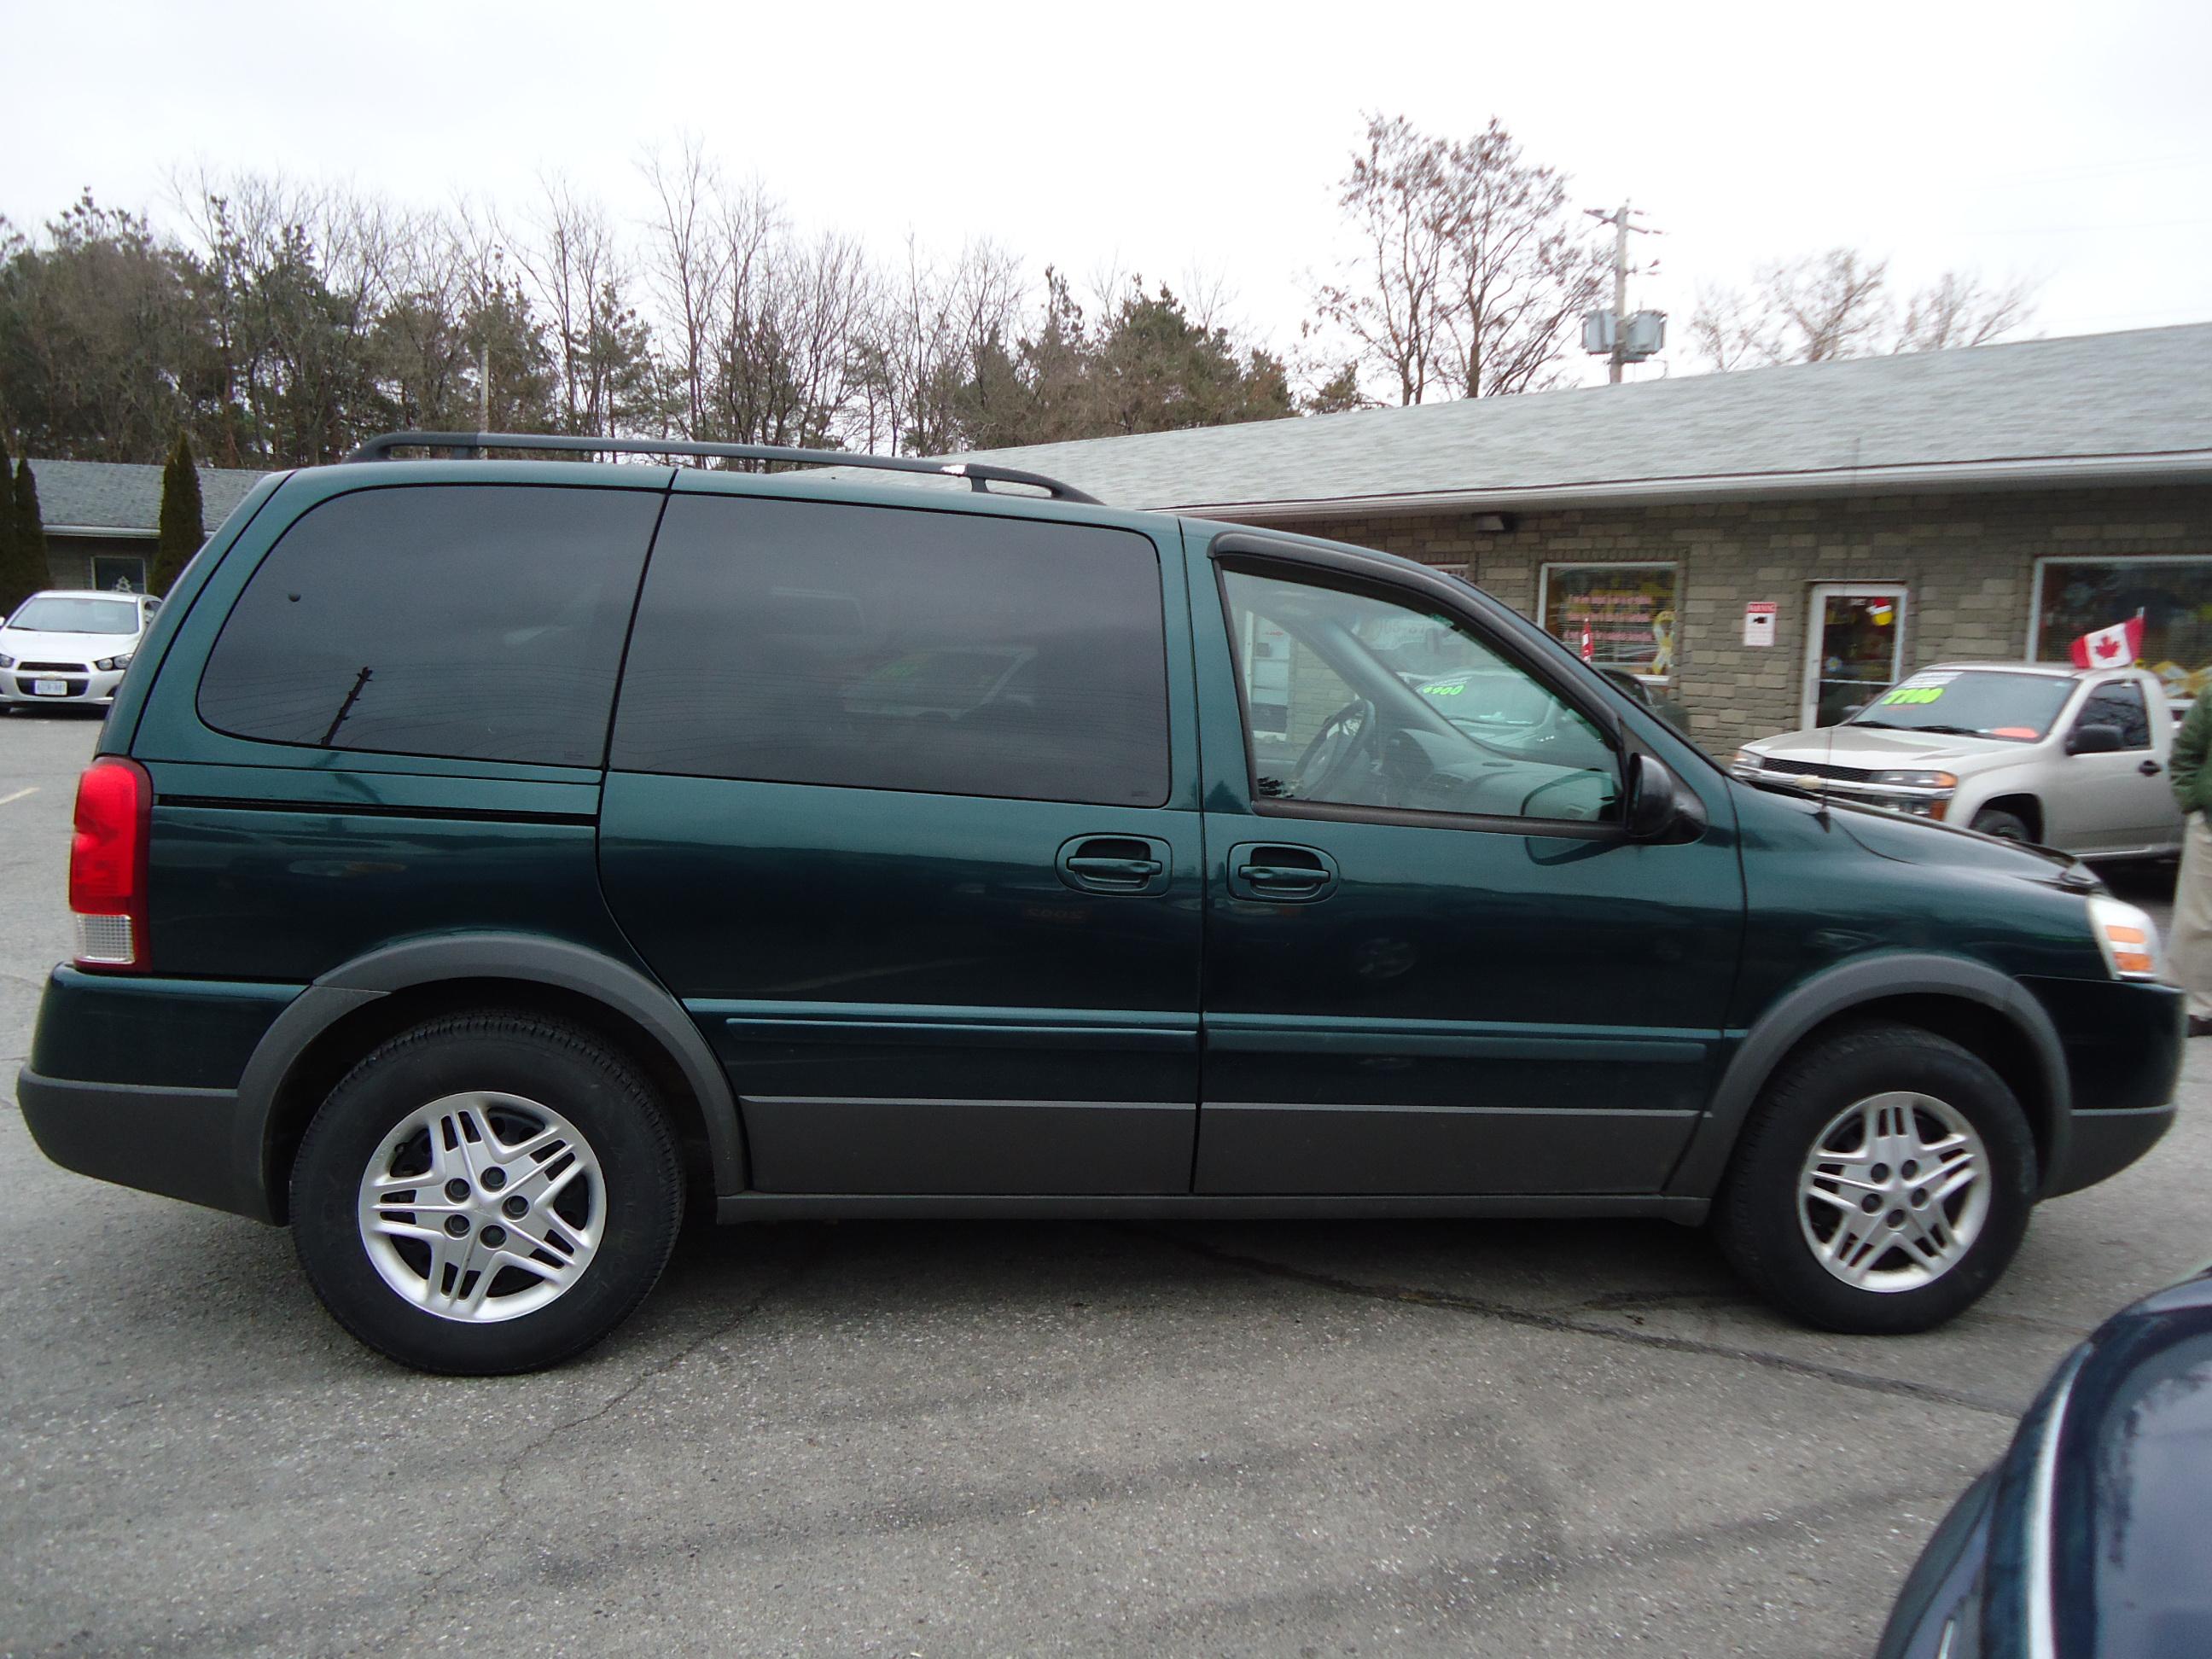 2005 pontiac montana sv6 green bob currie auto sales. Black Bedroom Furniture Sets. Home Design Ideas